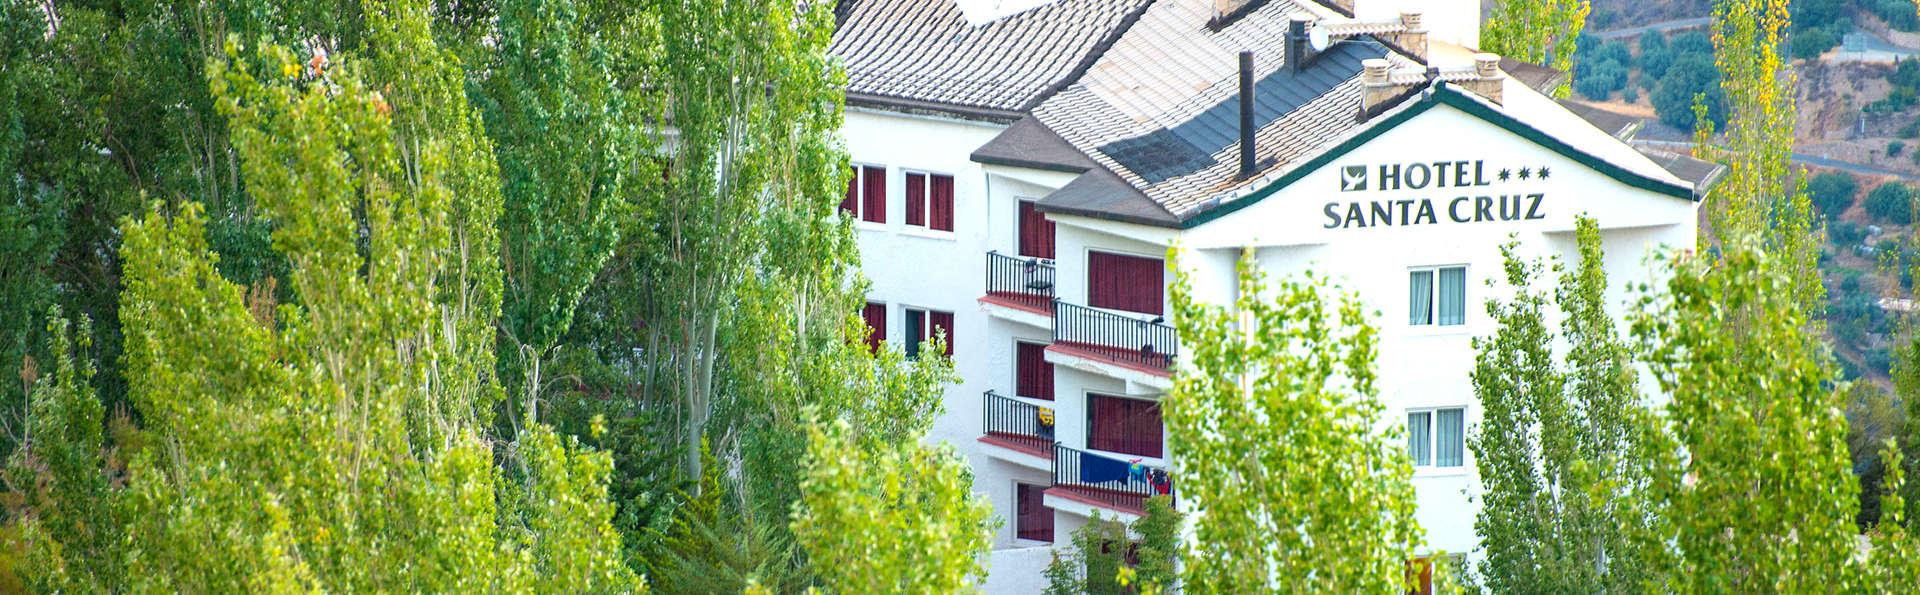 Hotel Santa Cruz (Granada) - Edit_Front.jpg